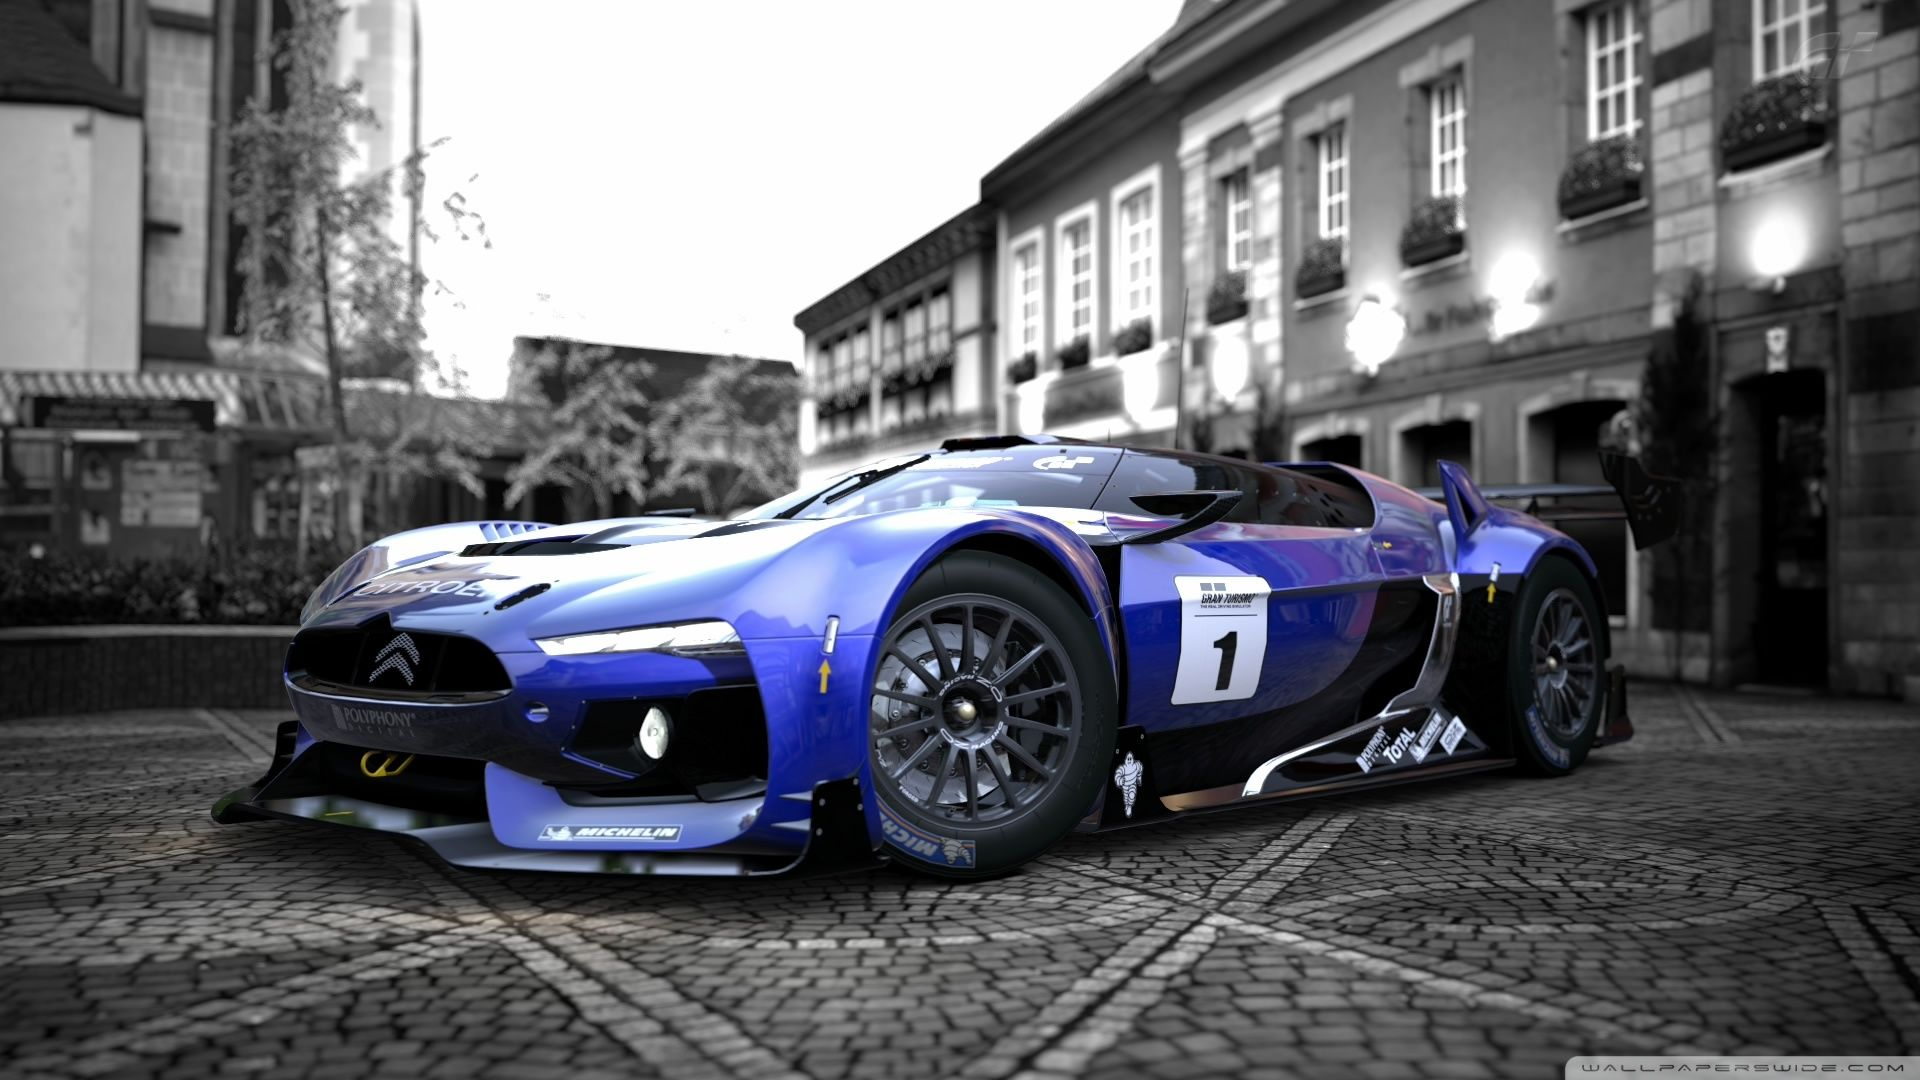 Racing Cars Wallpapers Wide Car Hd Car Wallpapers Race Cars